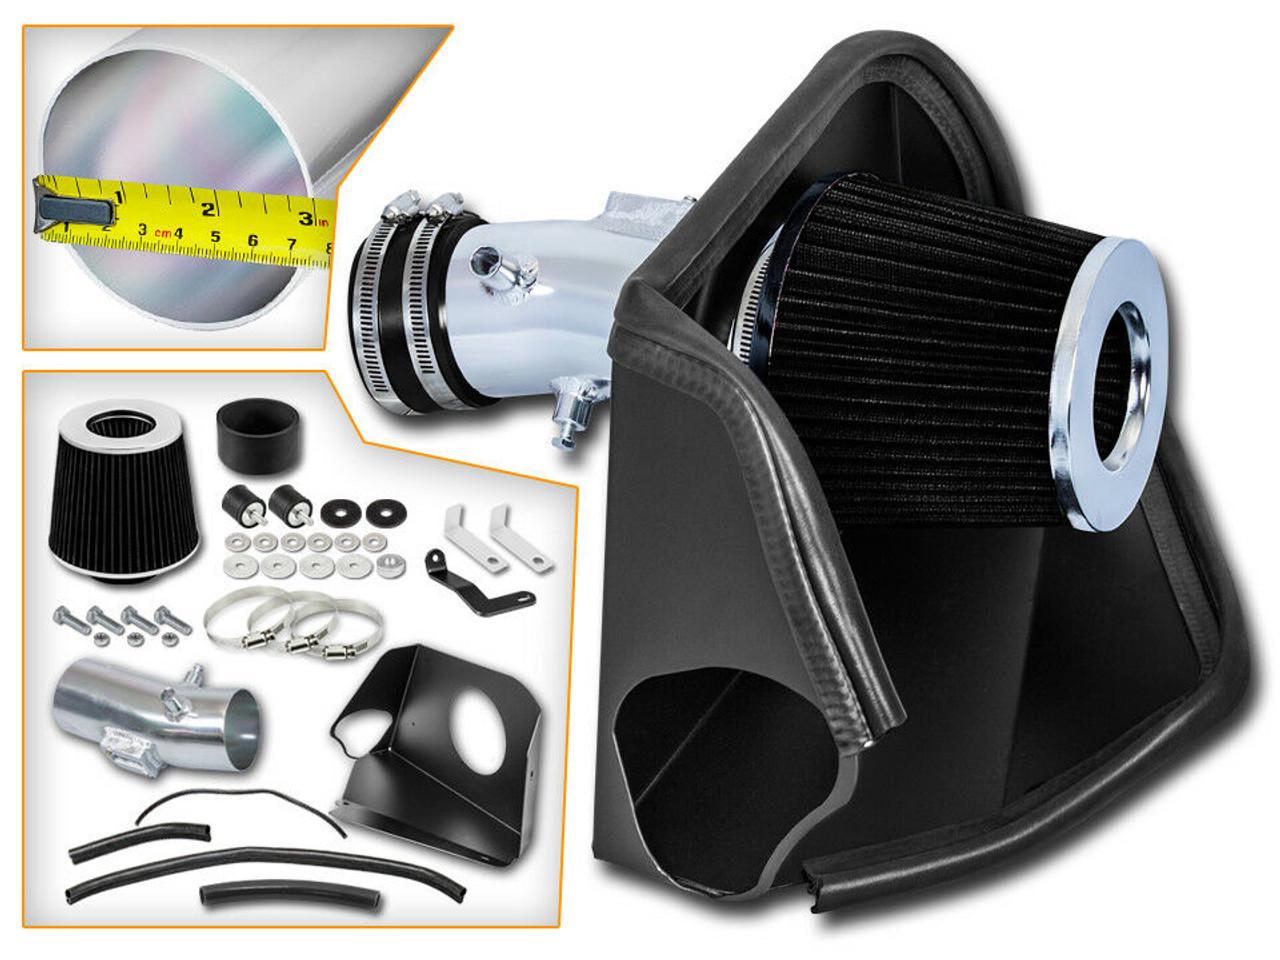 High-Performance Tuner Chip /& Power Tuning Programmer Boost Horsepower /& Torque! Fits Nissan Altima